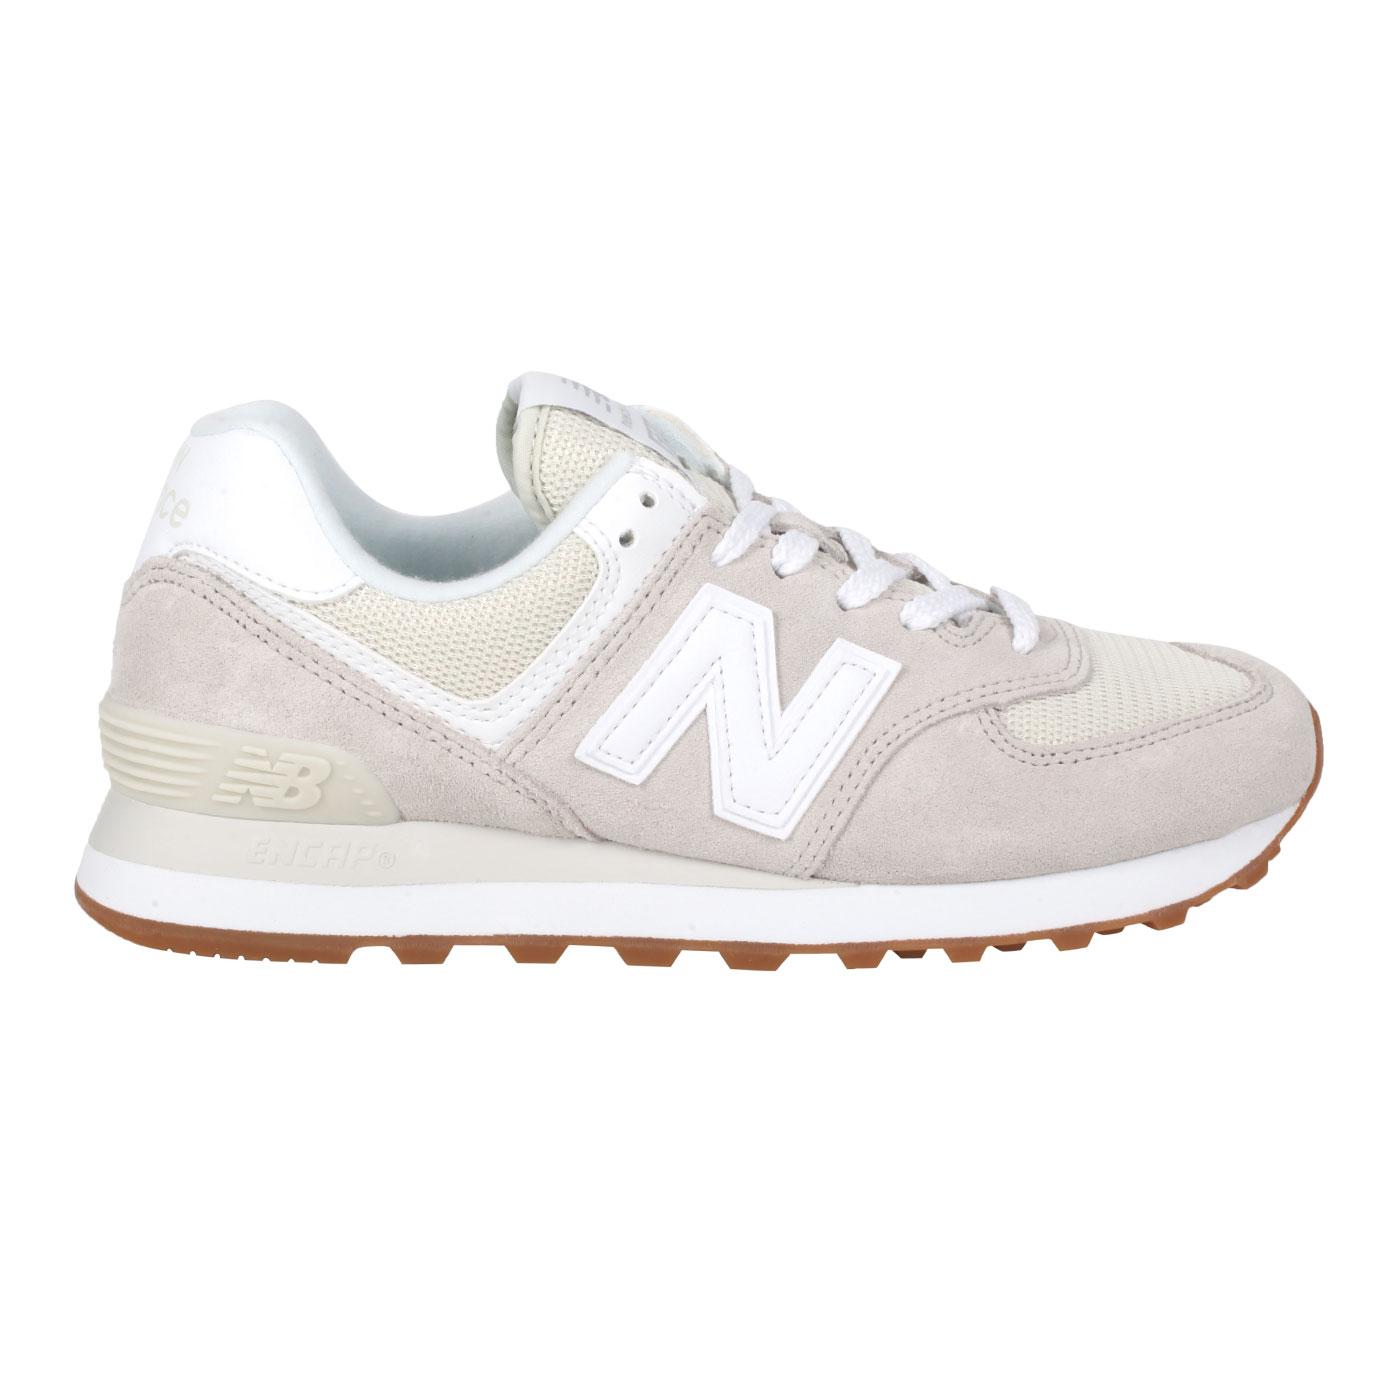 NEW BALANCE 女款休閒運動鞋 WL574PC2 - 淺灰白